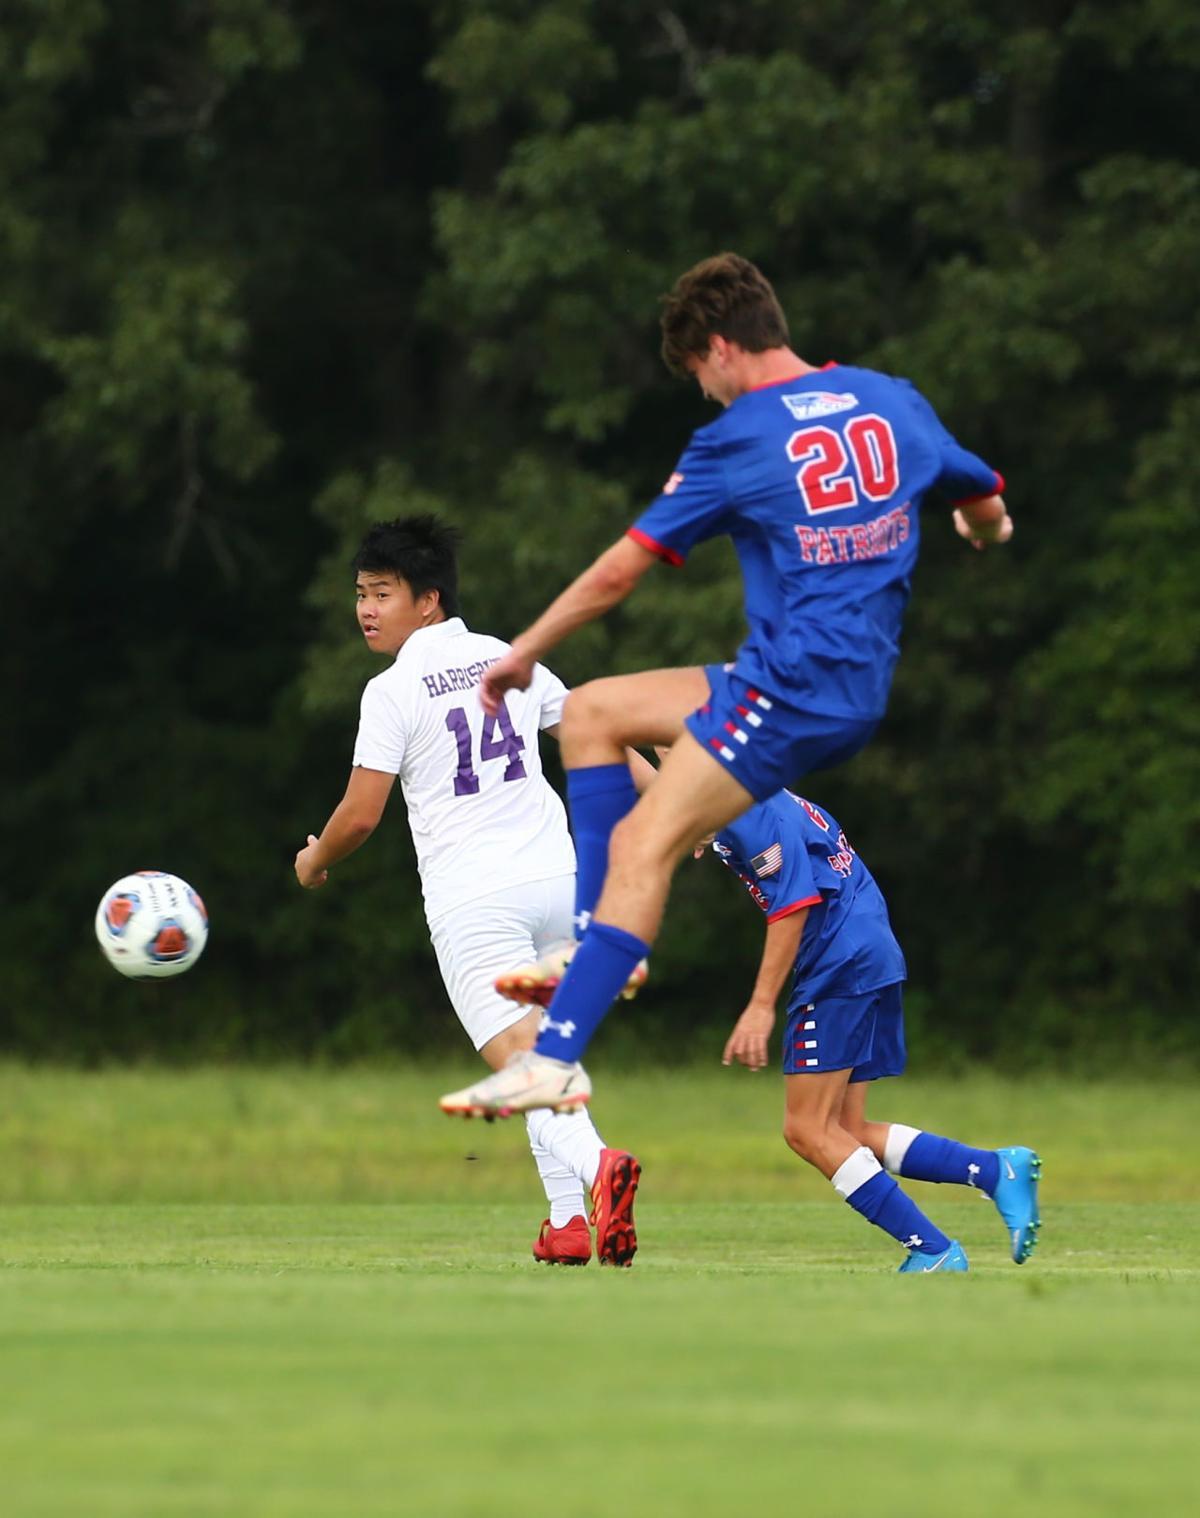 METSPTS-09-02-21 MCHS Soccer vs Harrisburg_PHOTO 2